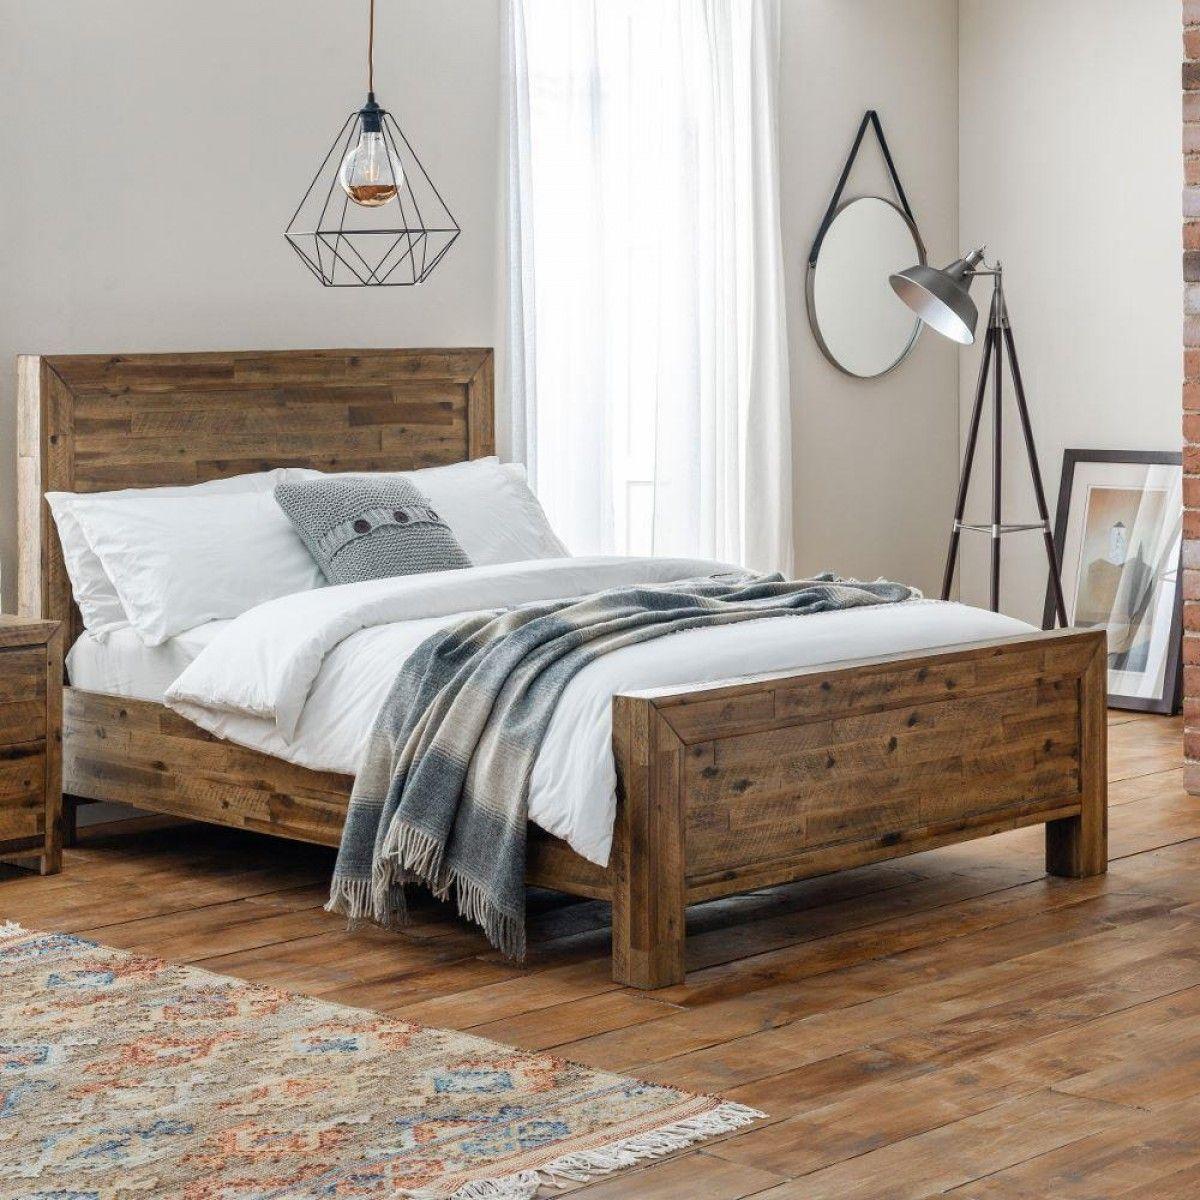 Hoxton Rustic Oak Wooden Bed In 2020 Wooden Bed Frames Oak Beds